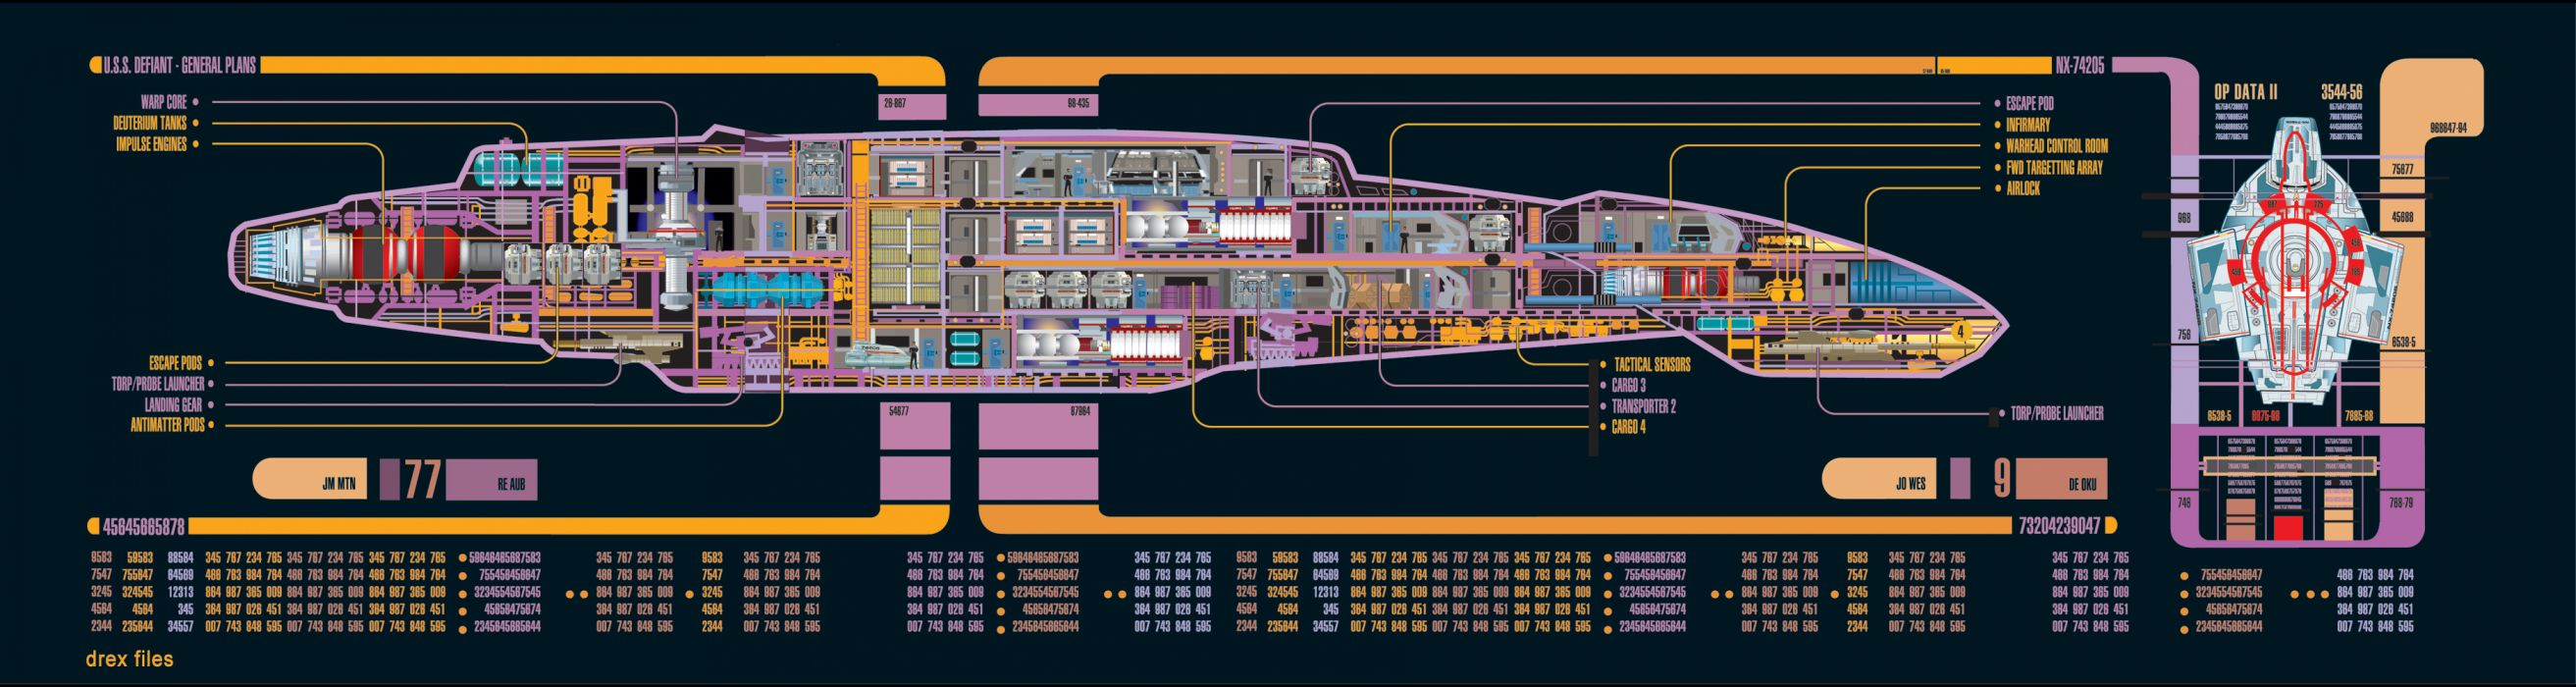 Star Trek Starship Defiant Spaceship wallpaper